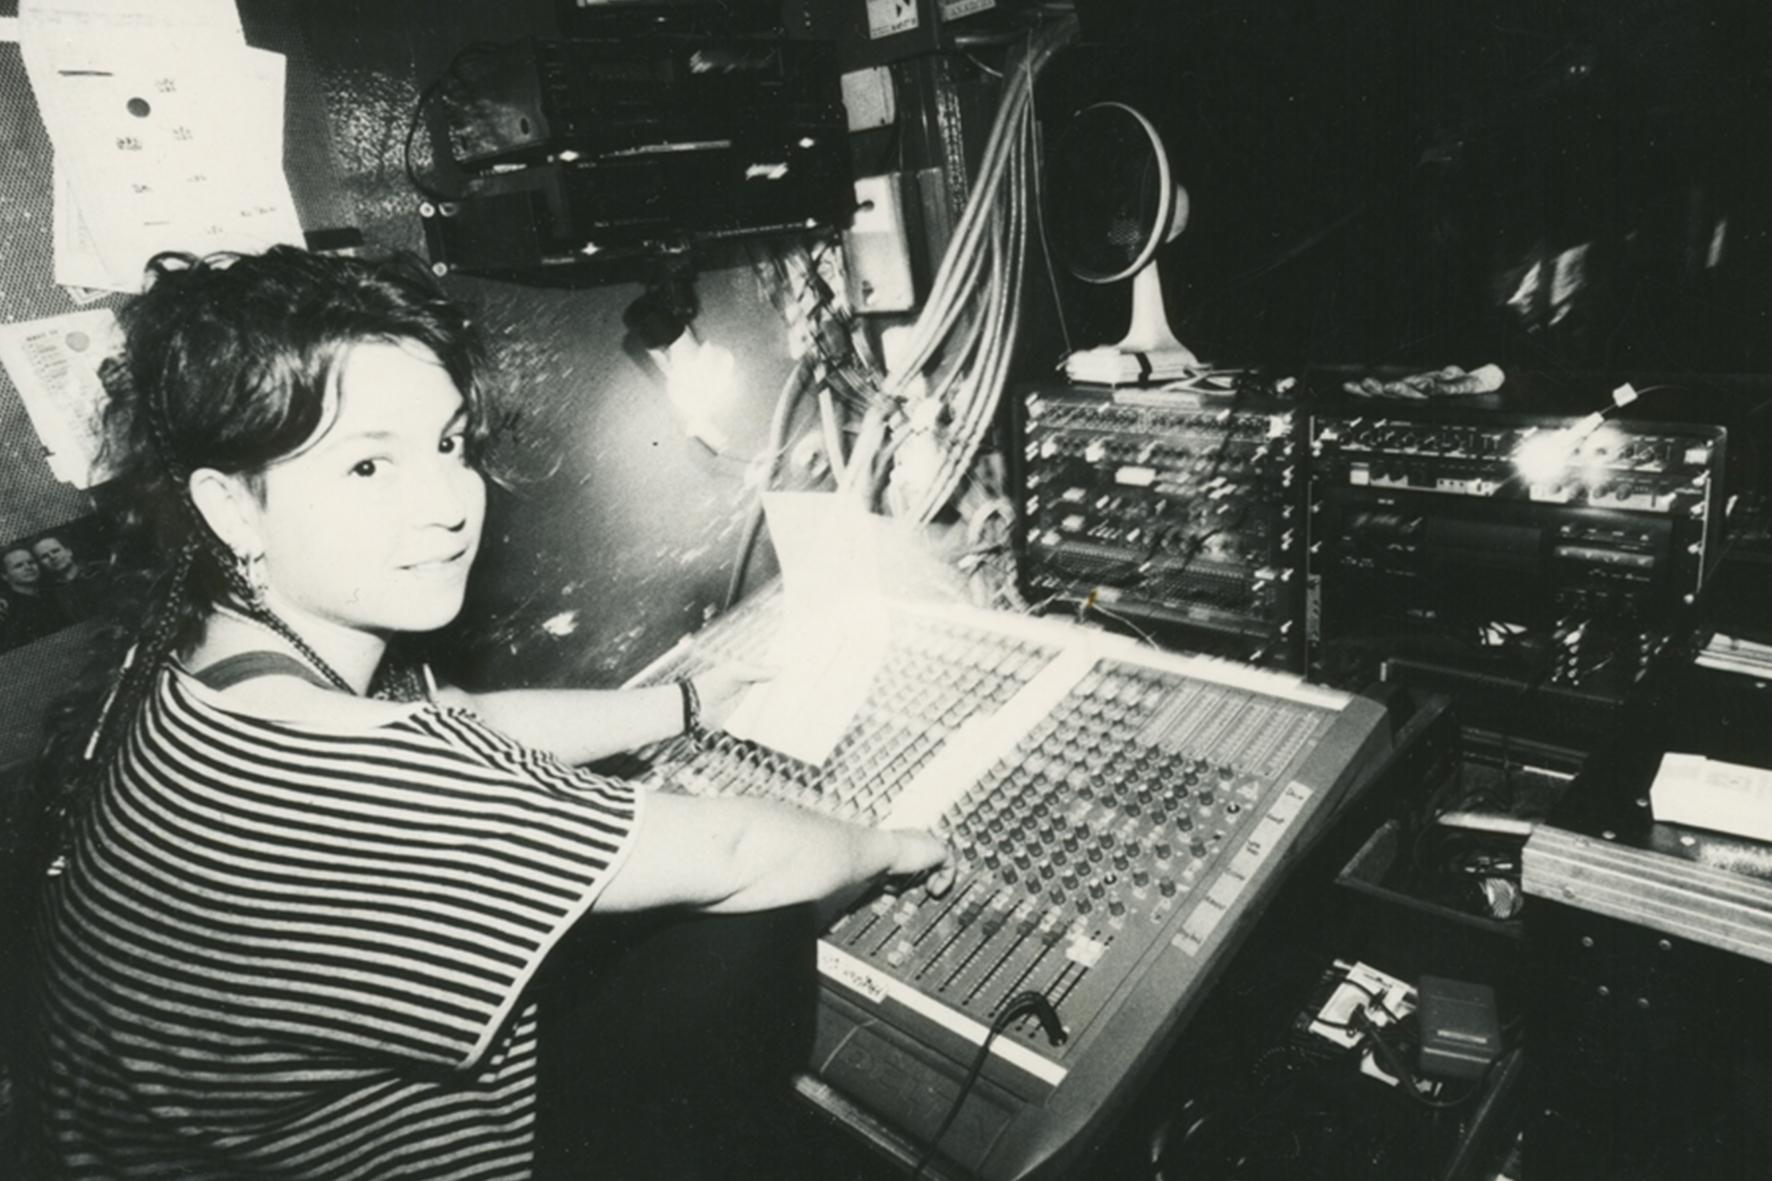 Marta im Knust (1993, Hamburg)